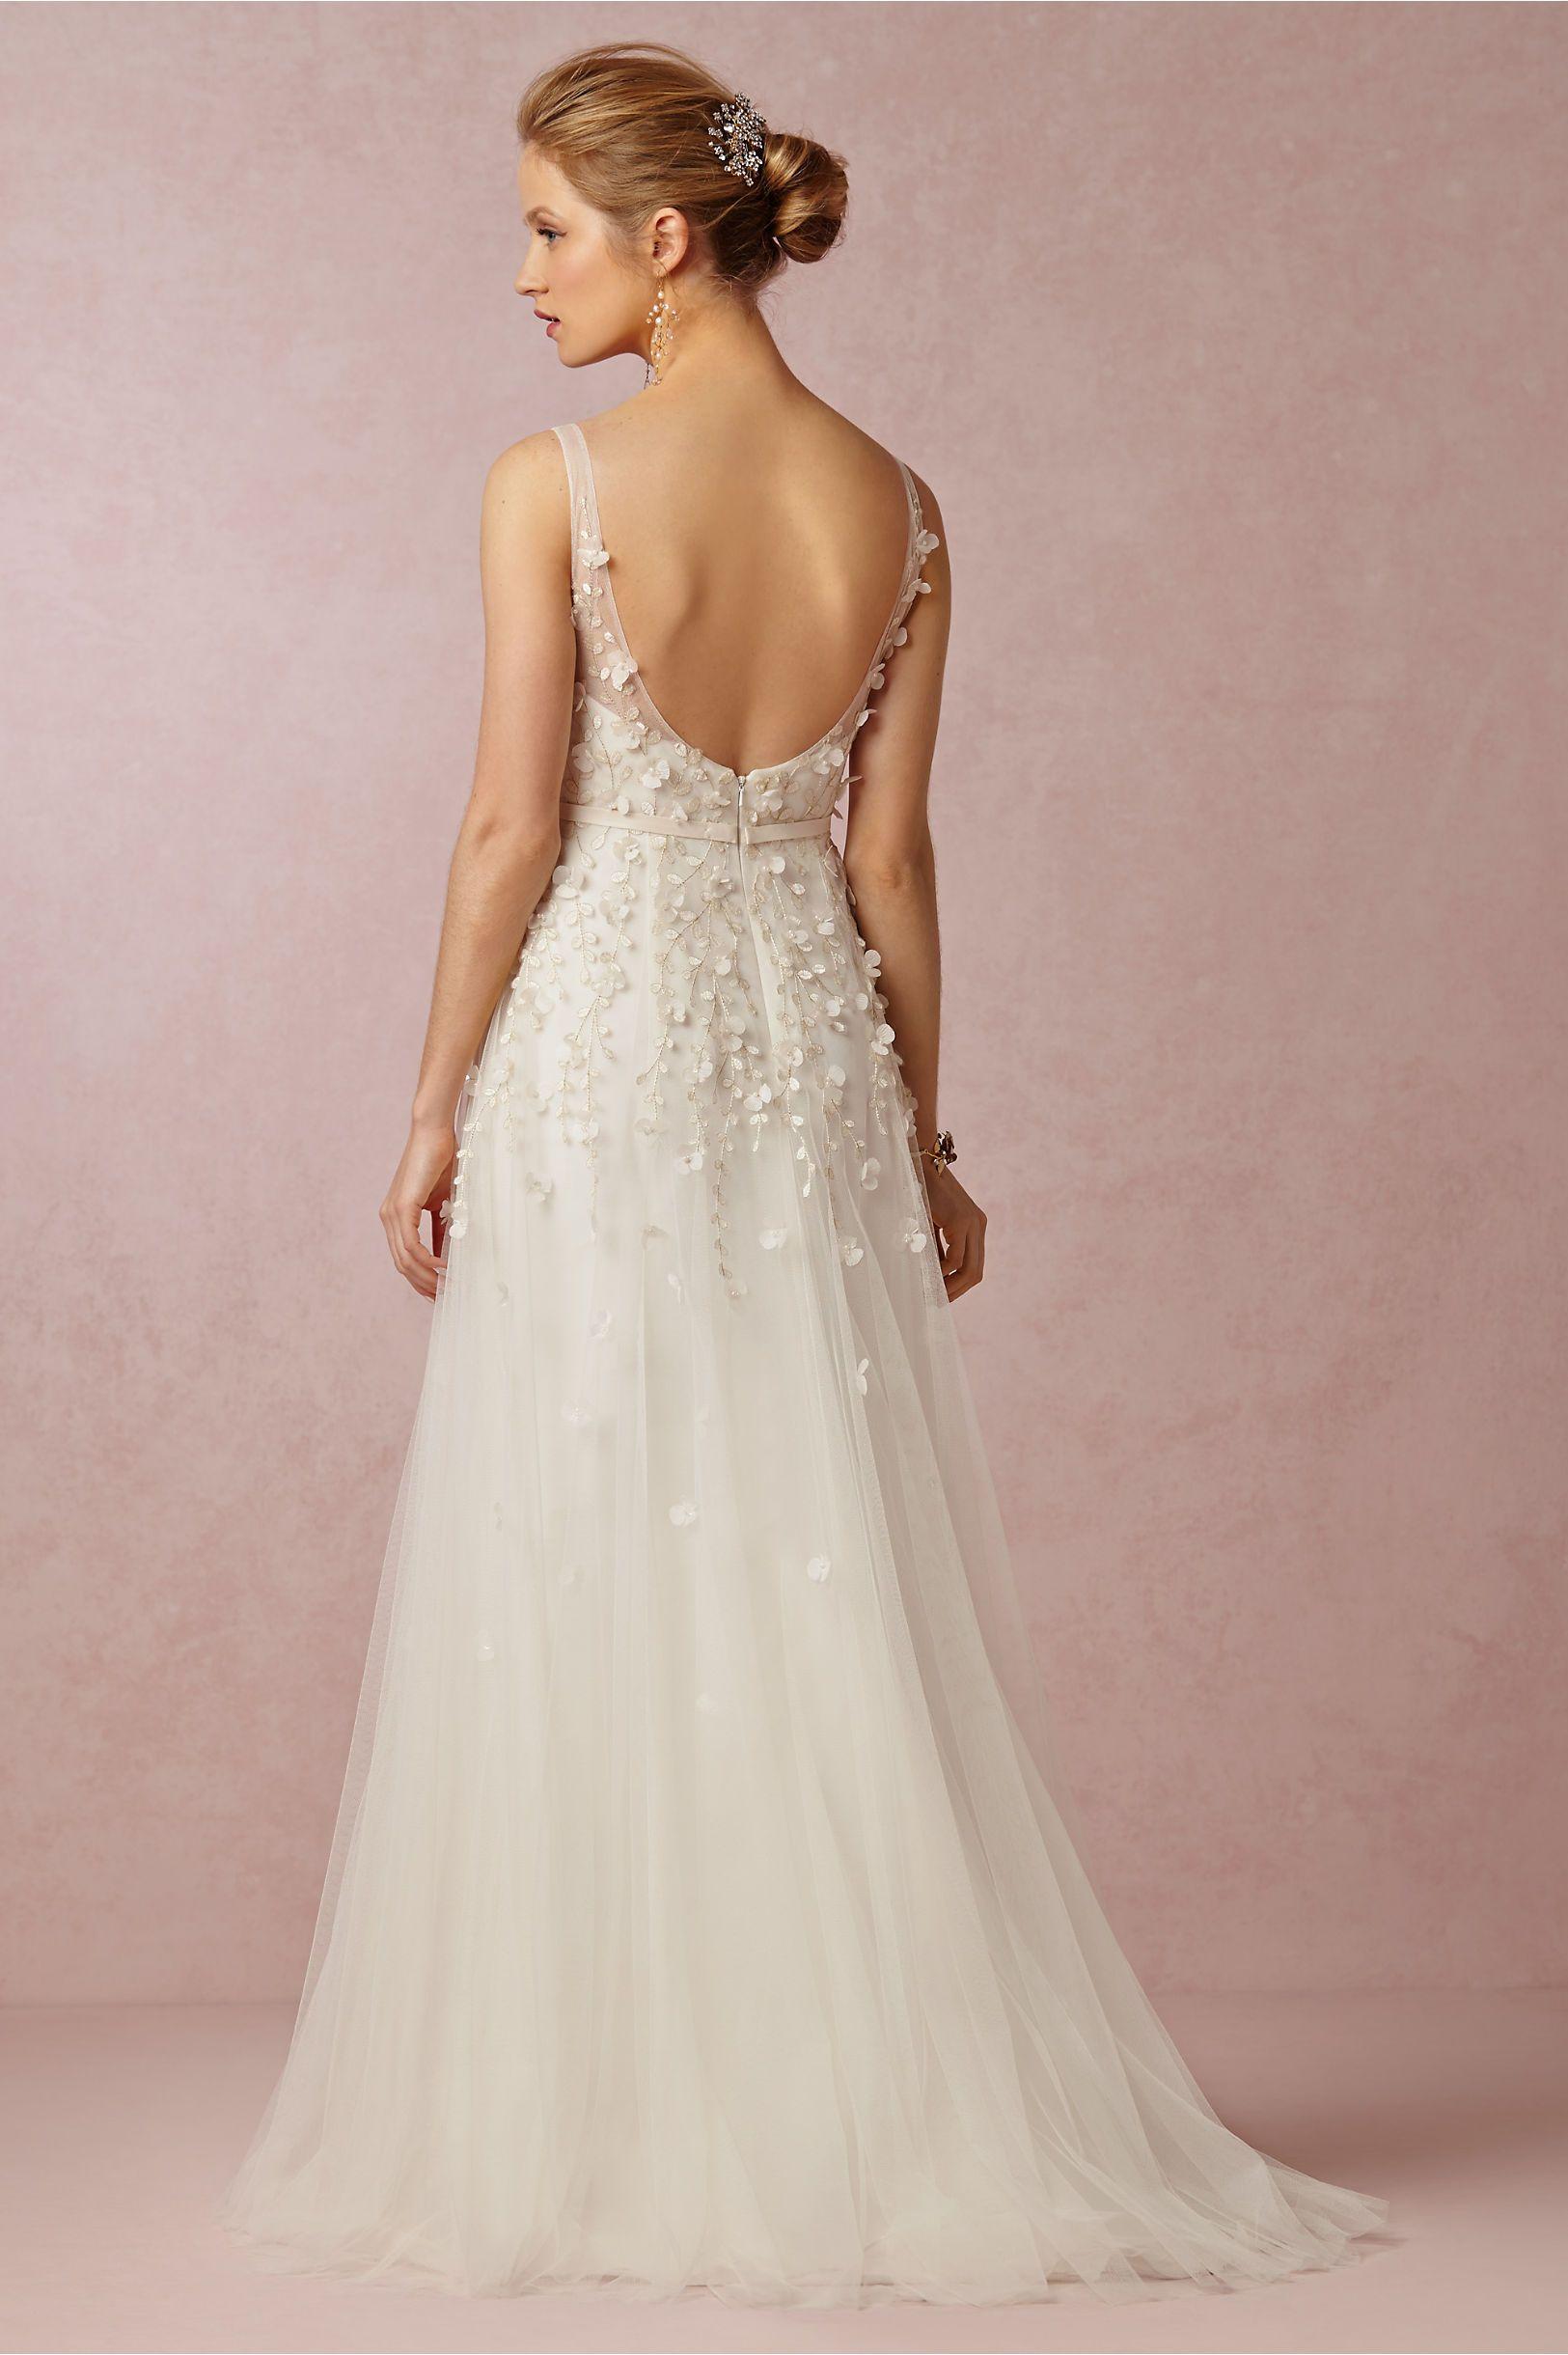 0c68d86fb487 Luisa Gown in Bride Wedding Dresses at BHLDN | Wedding Dresses in ...